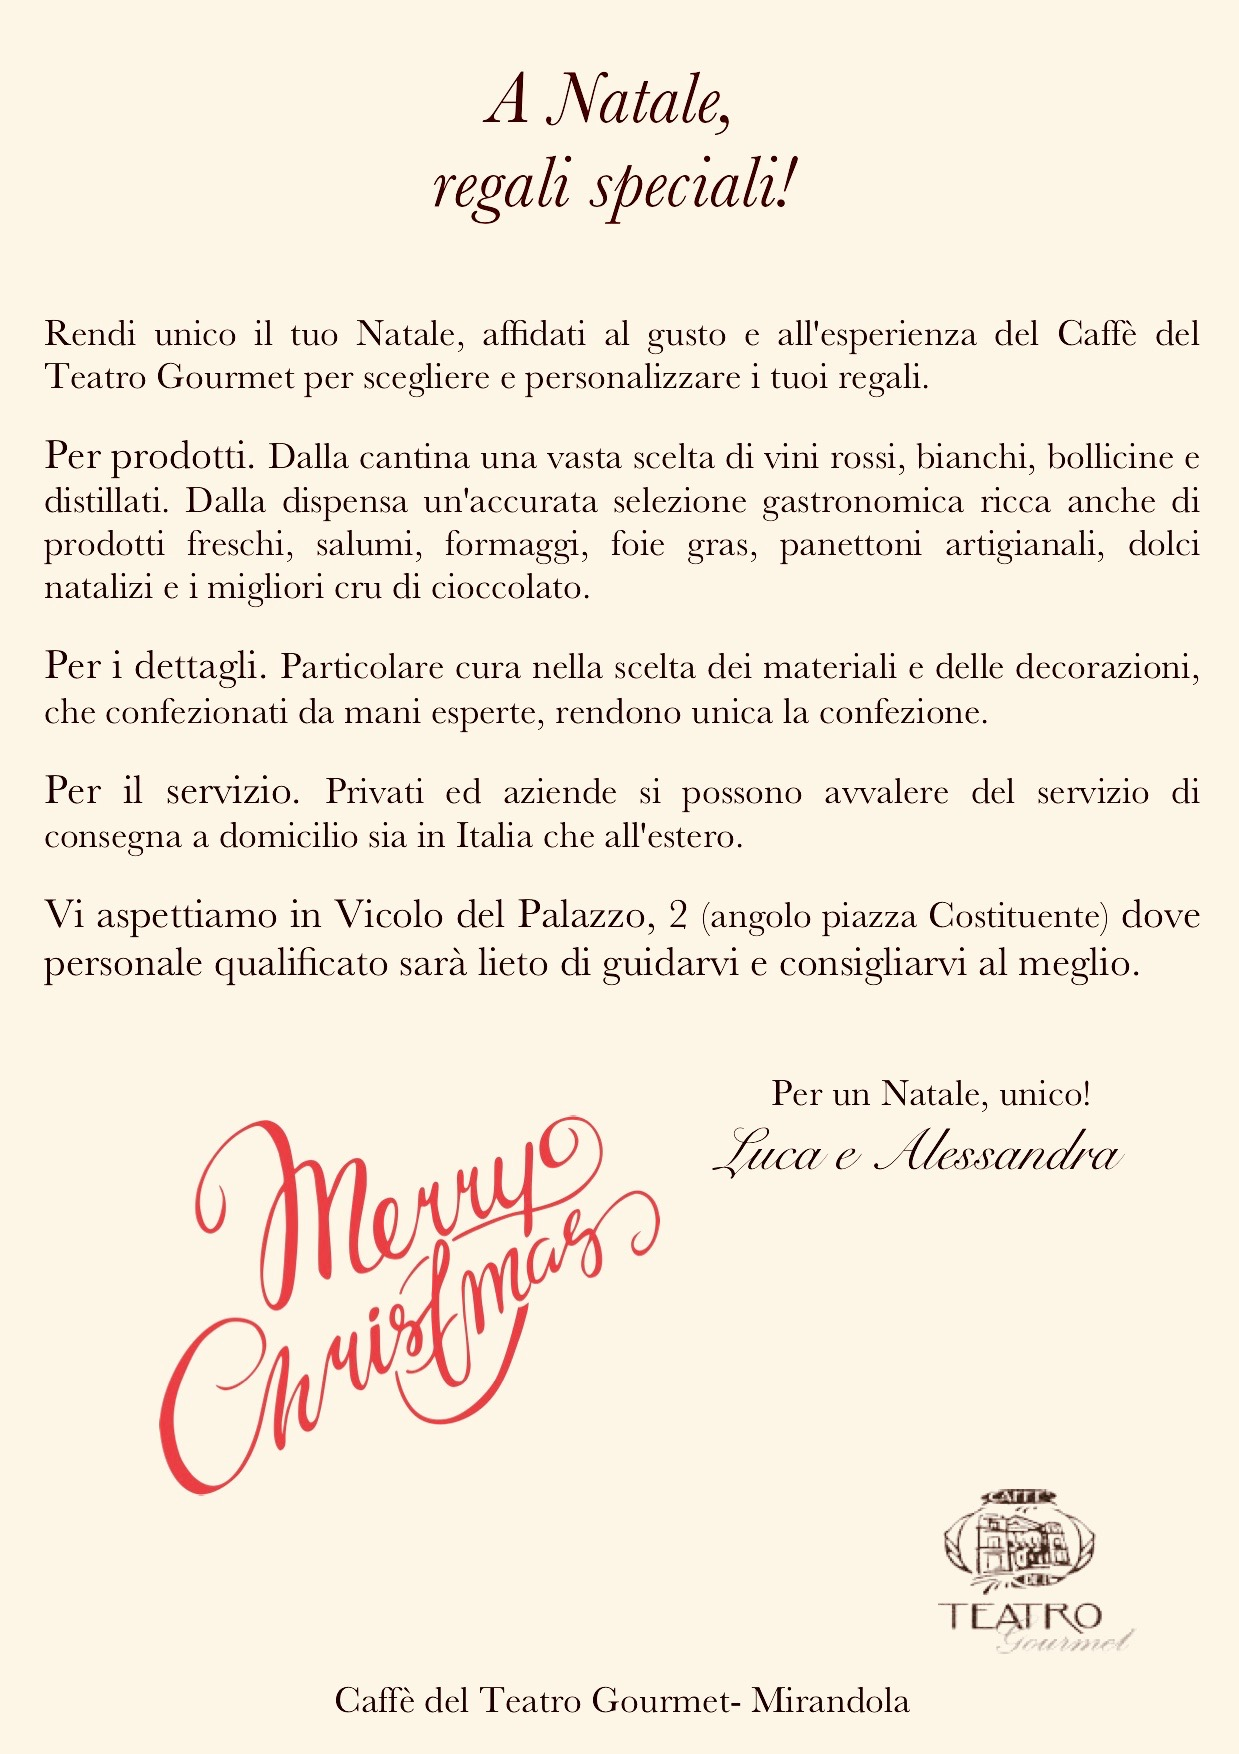 Lettera-Natale-20181.jpg